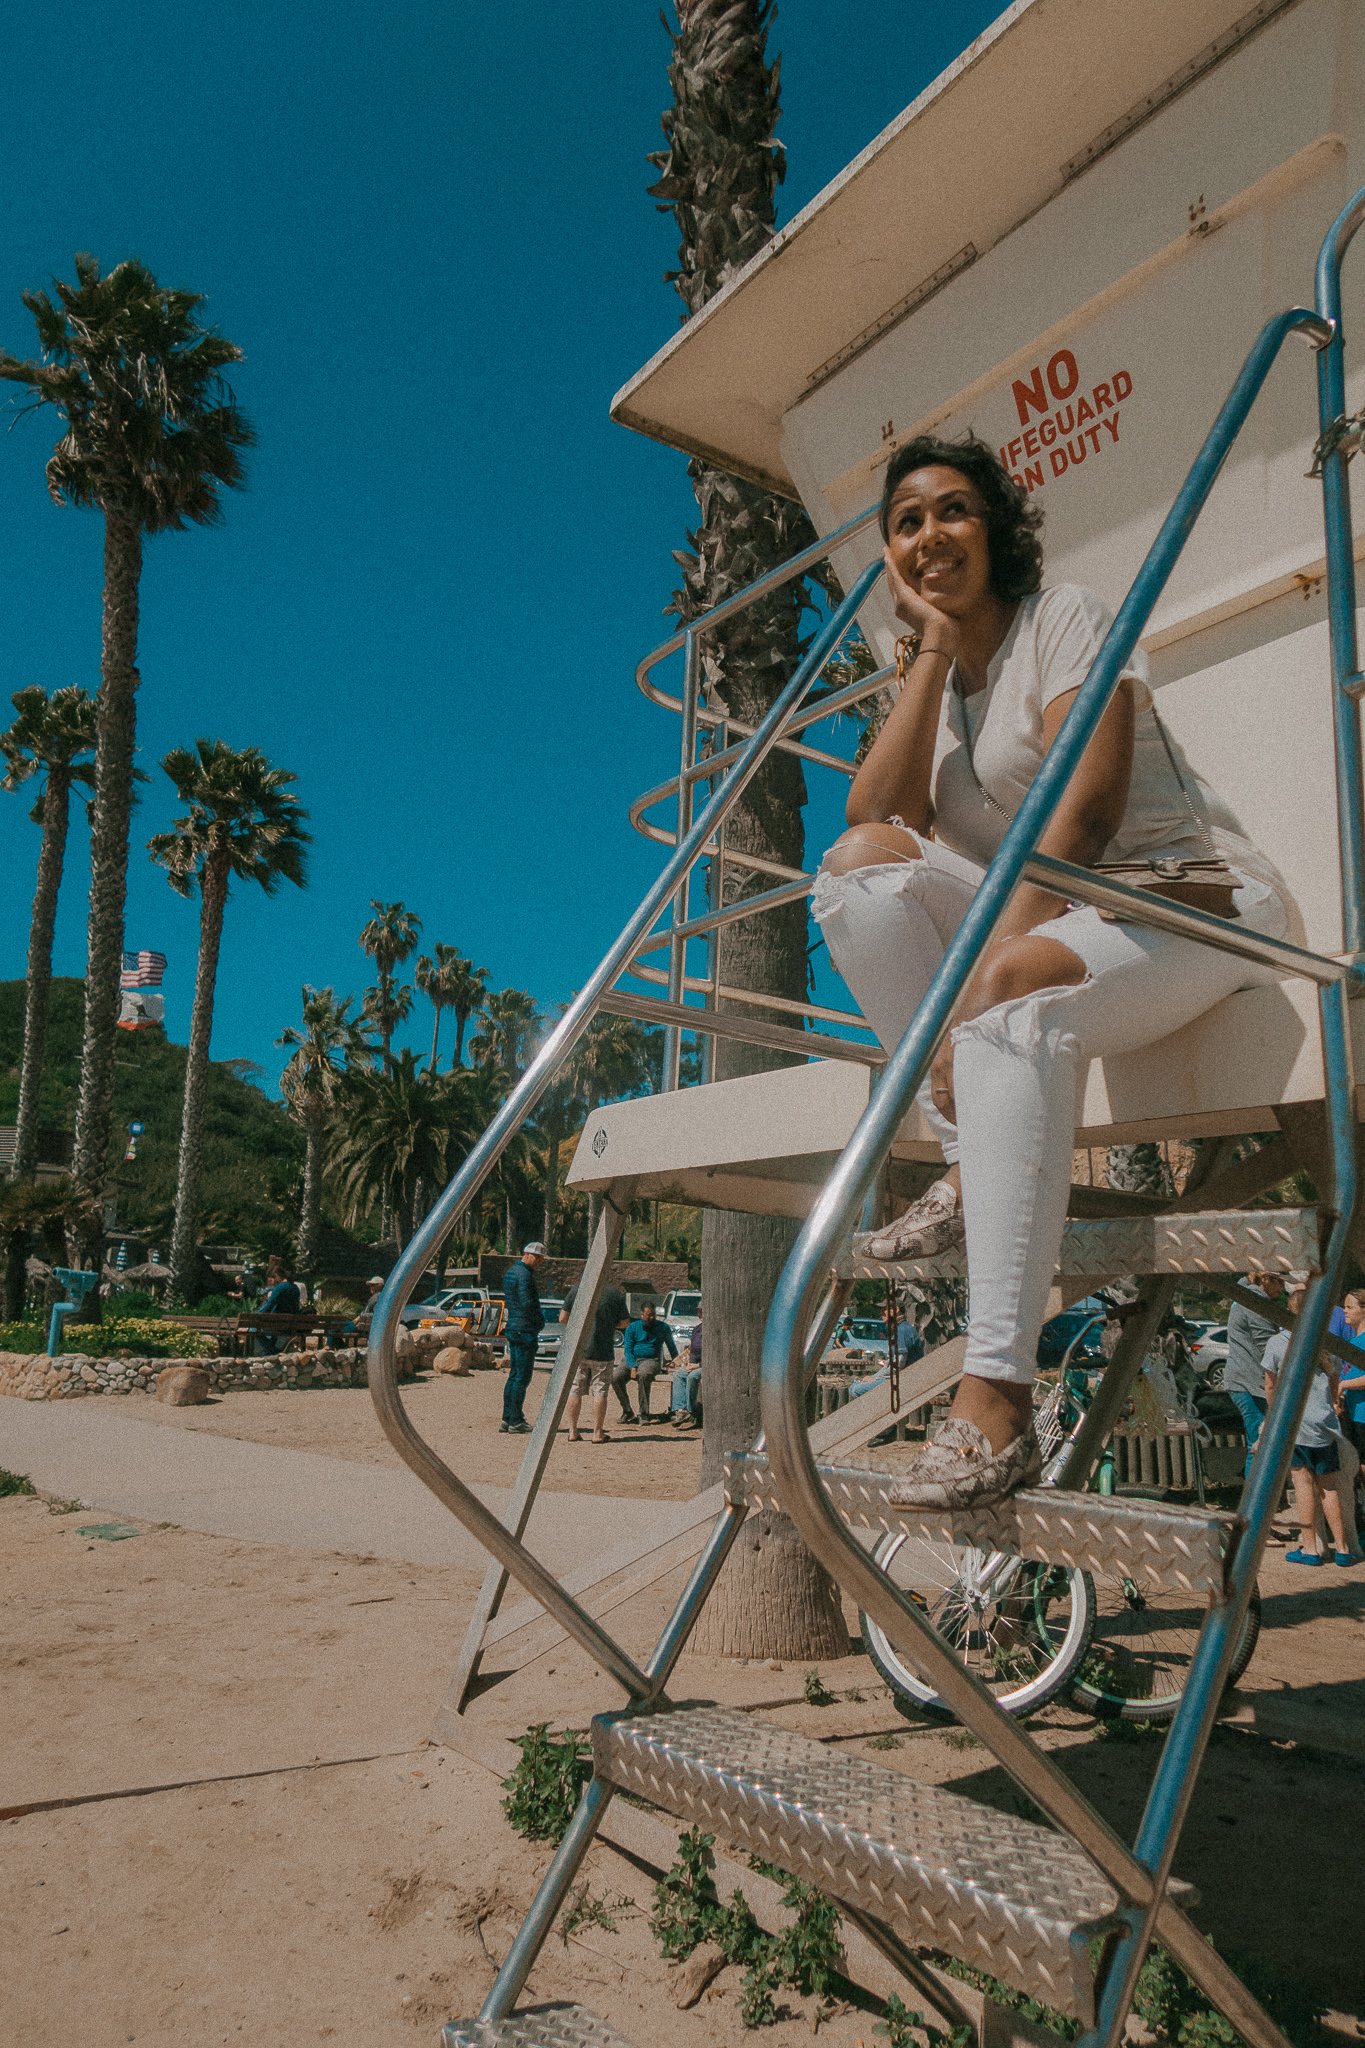 nicole fiona serrao canadian blogger in santa barbara california